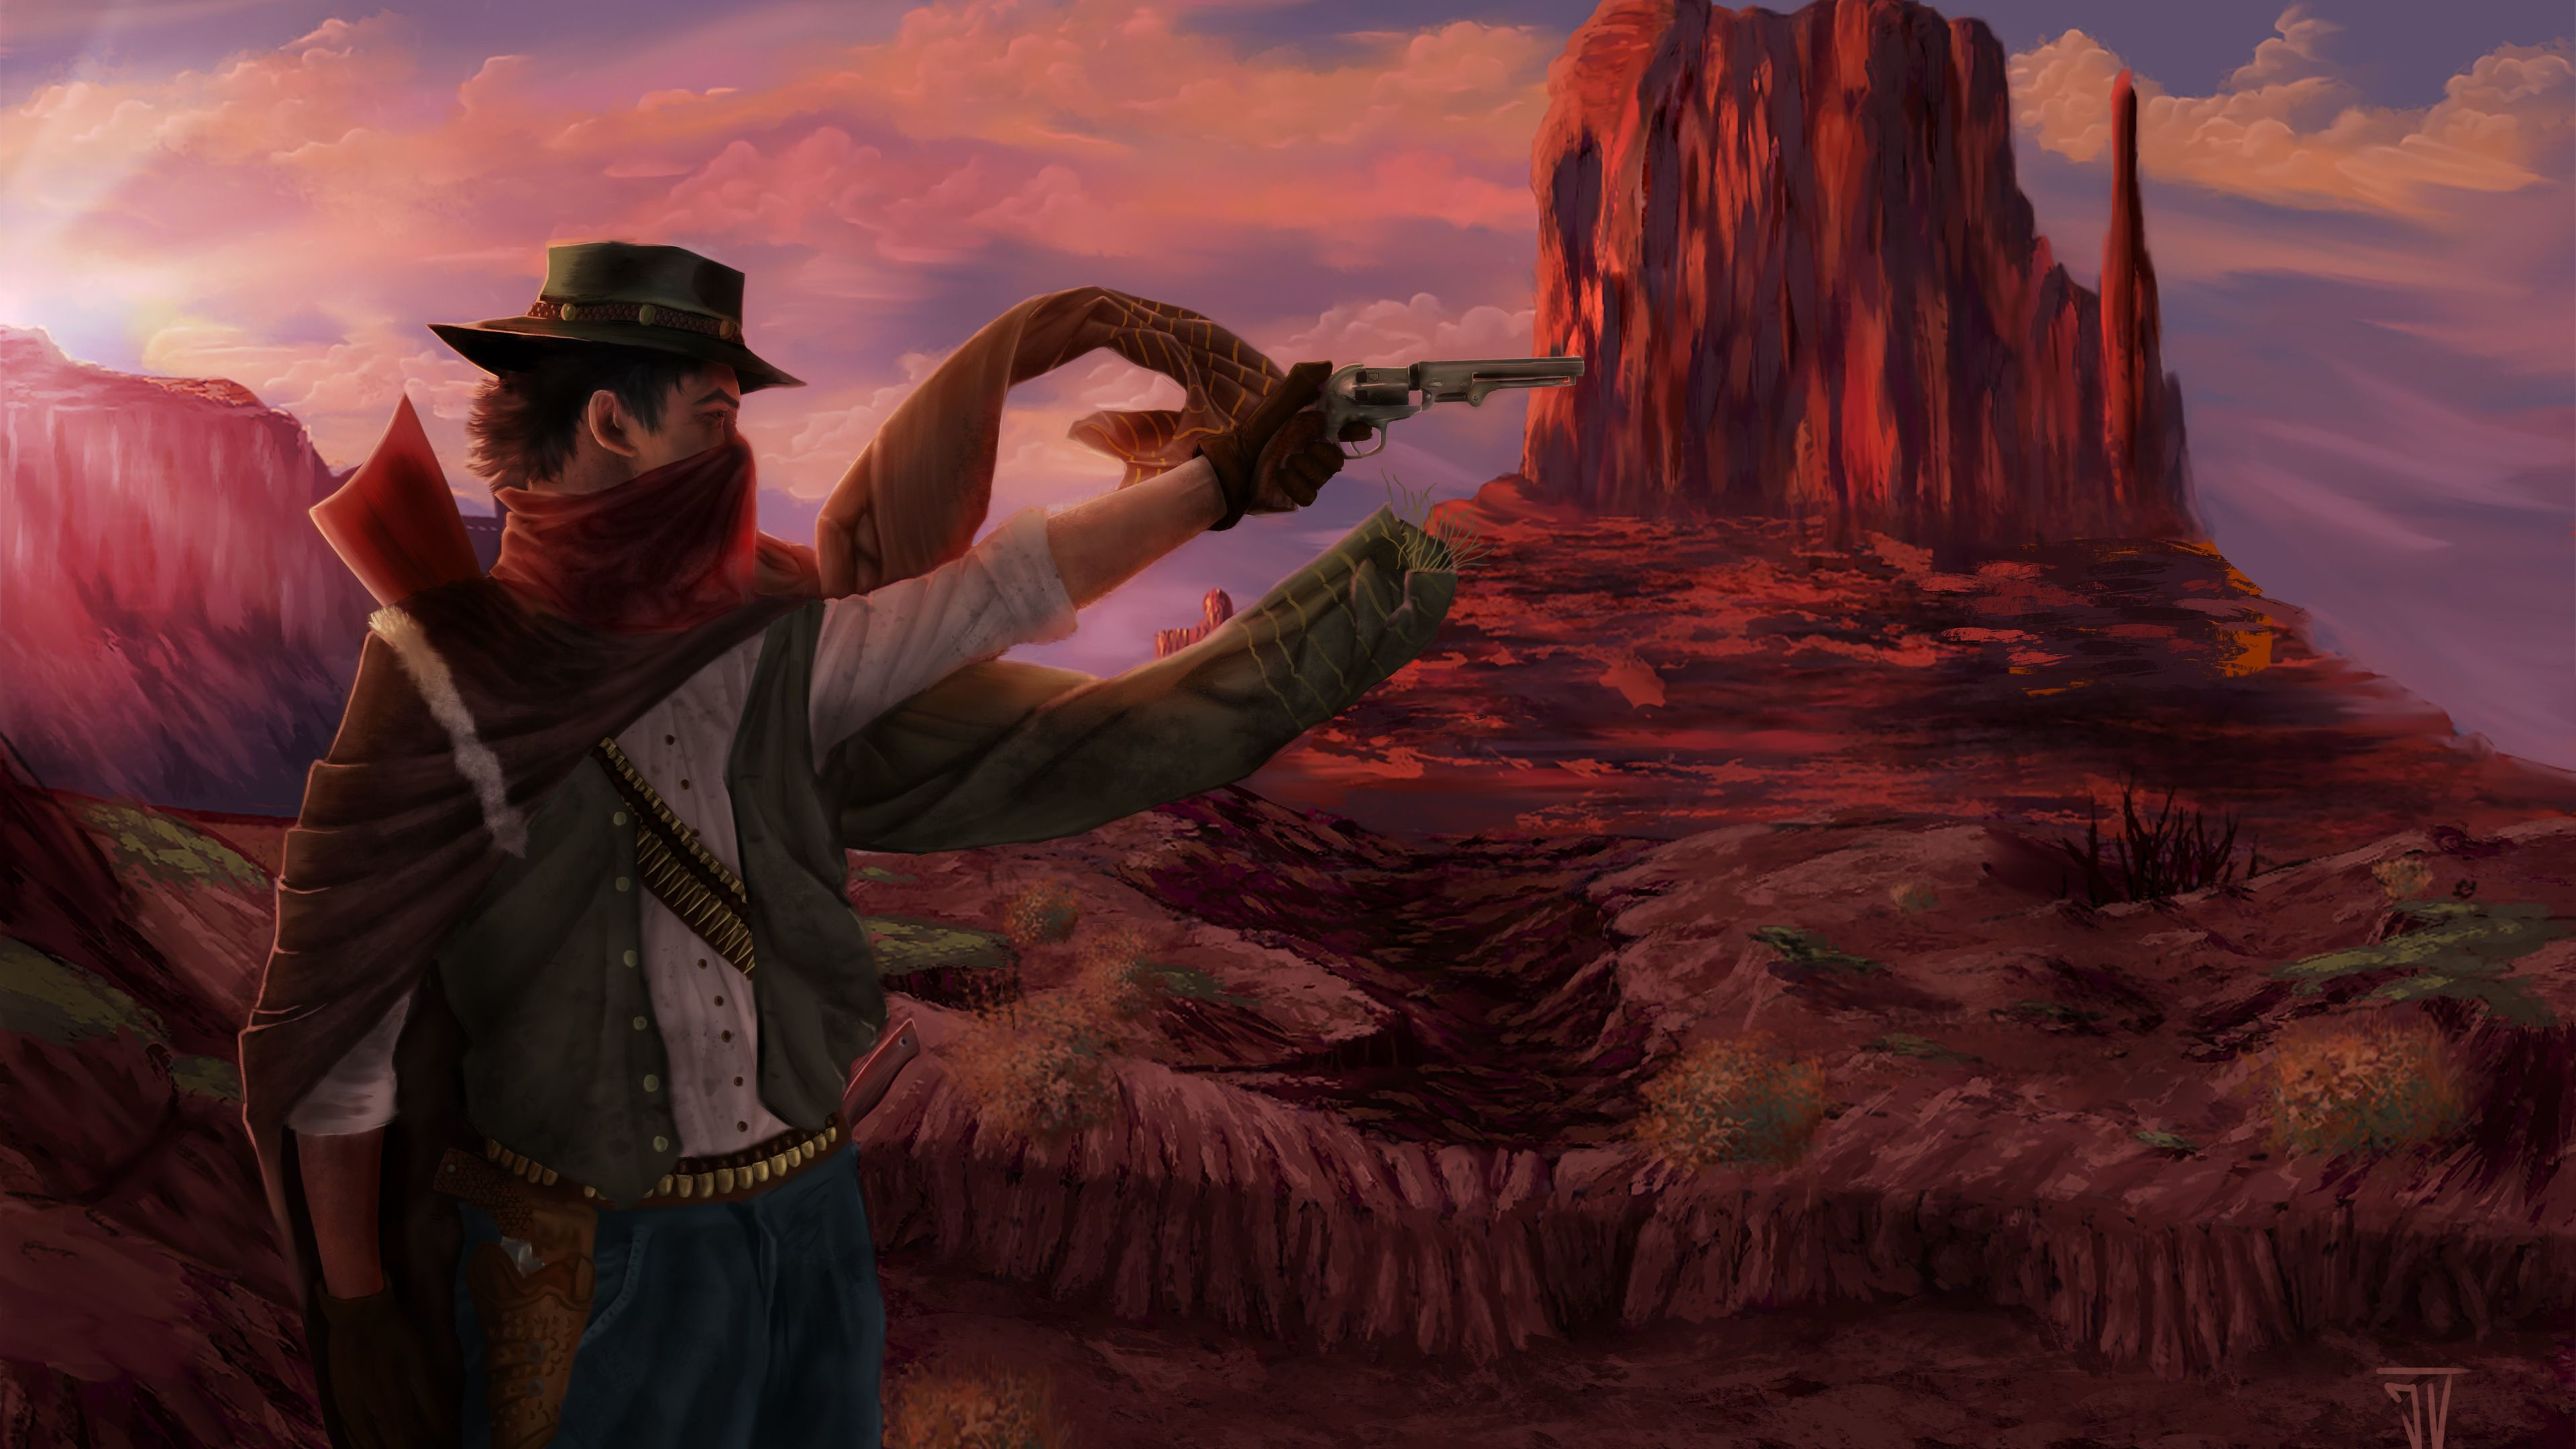 Wallpaper 4k John Marston Red Dead Redemption 2 2018 Games